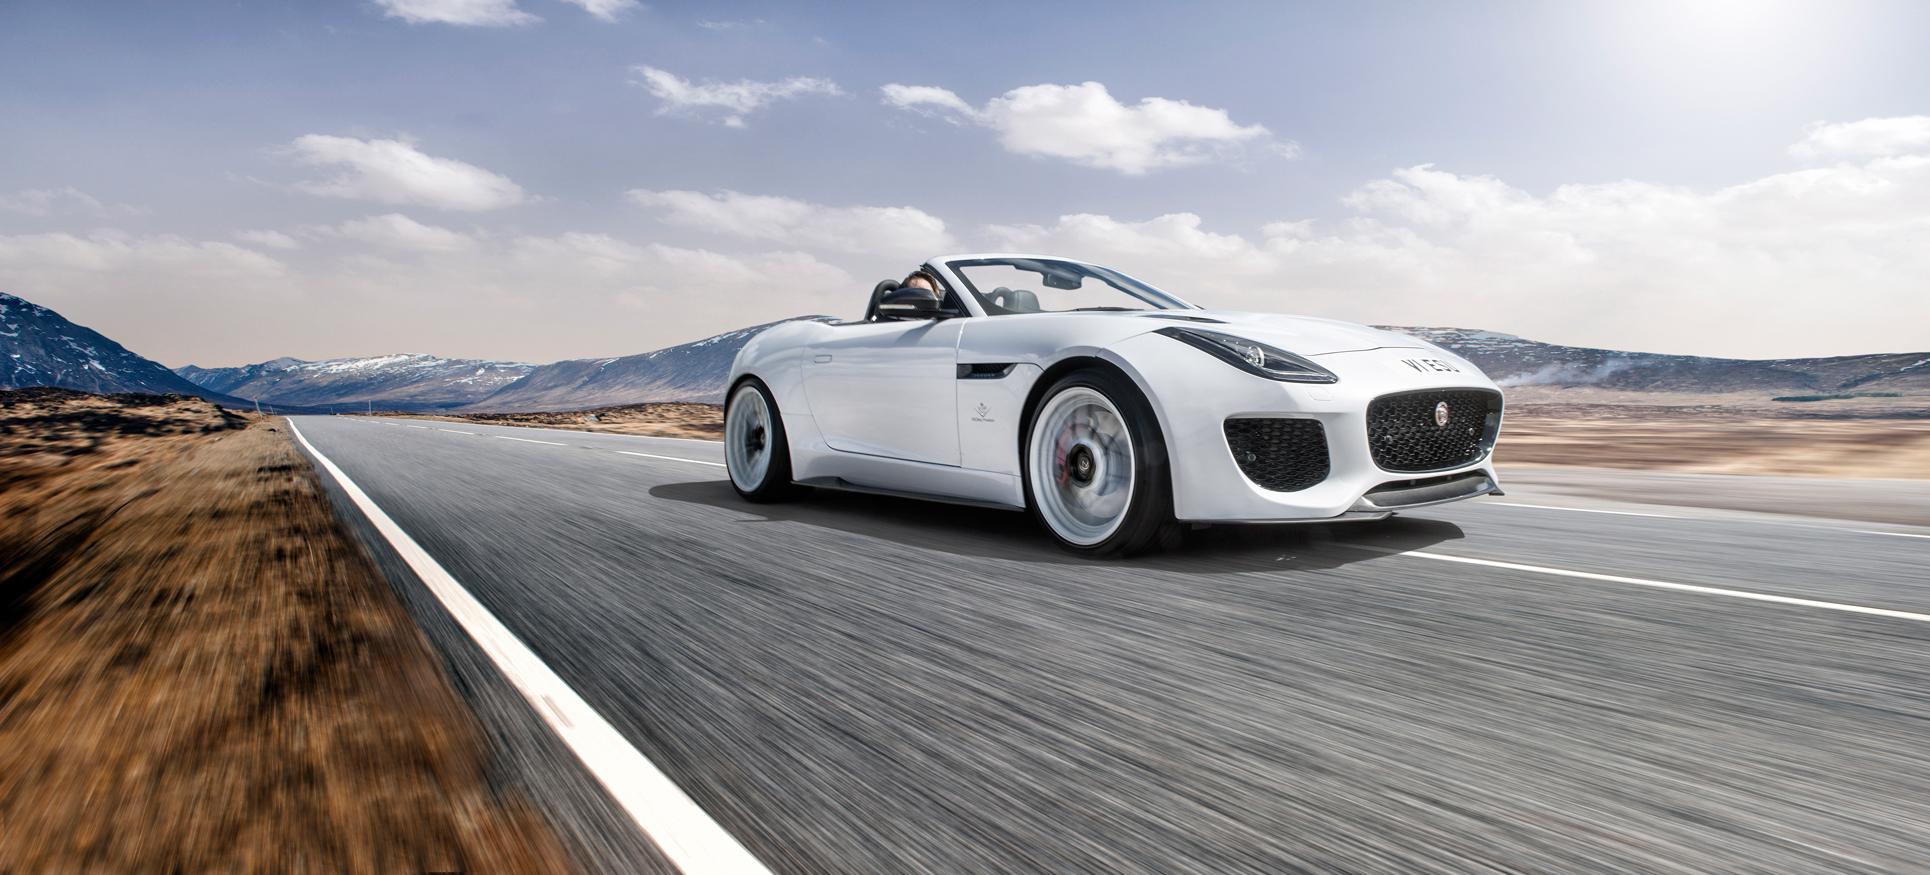 Jaguar F-Type Project Predator Bumper